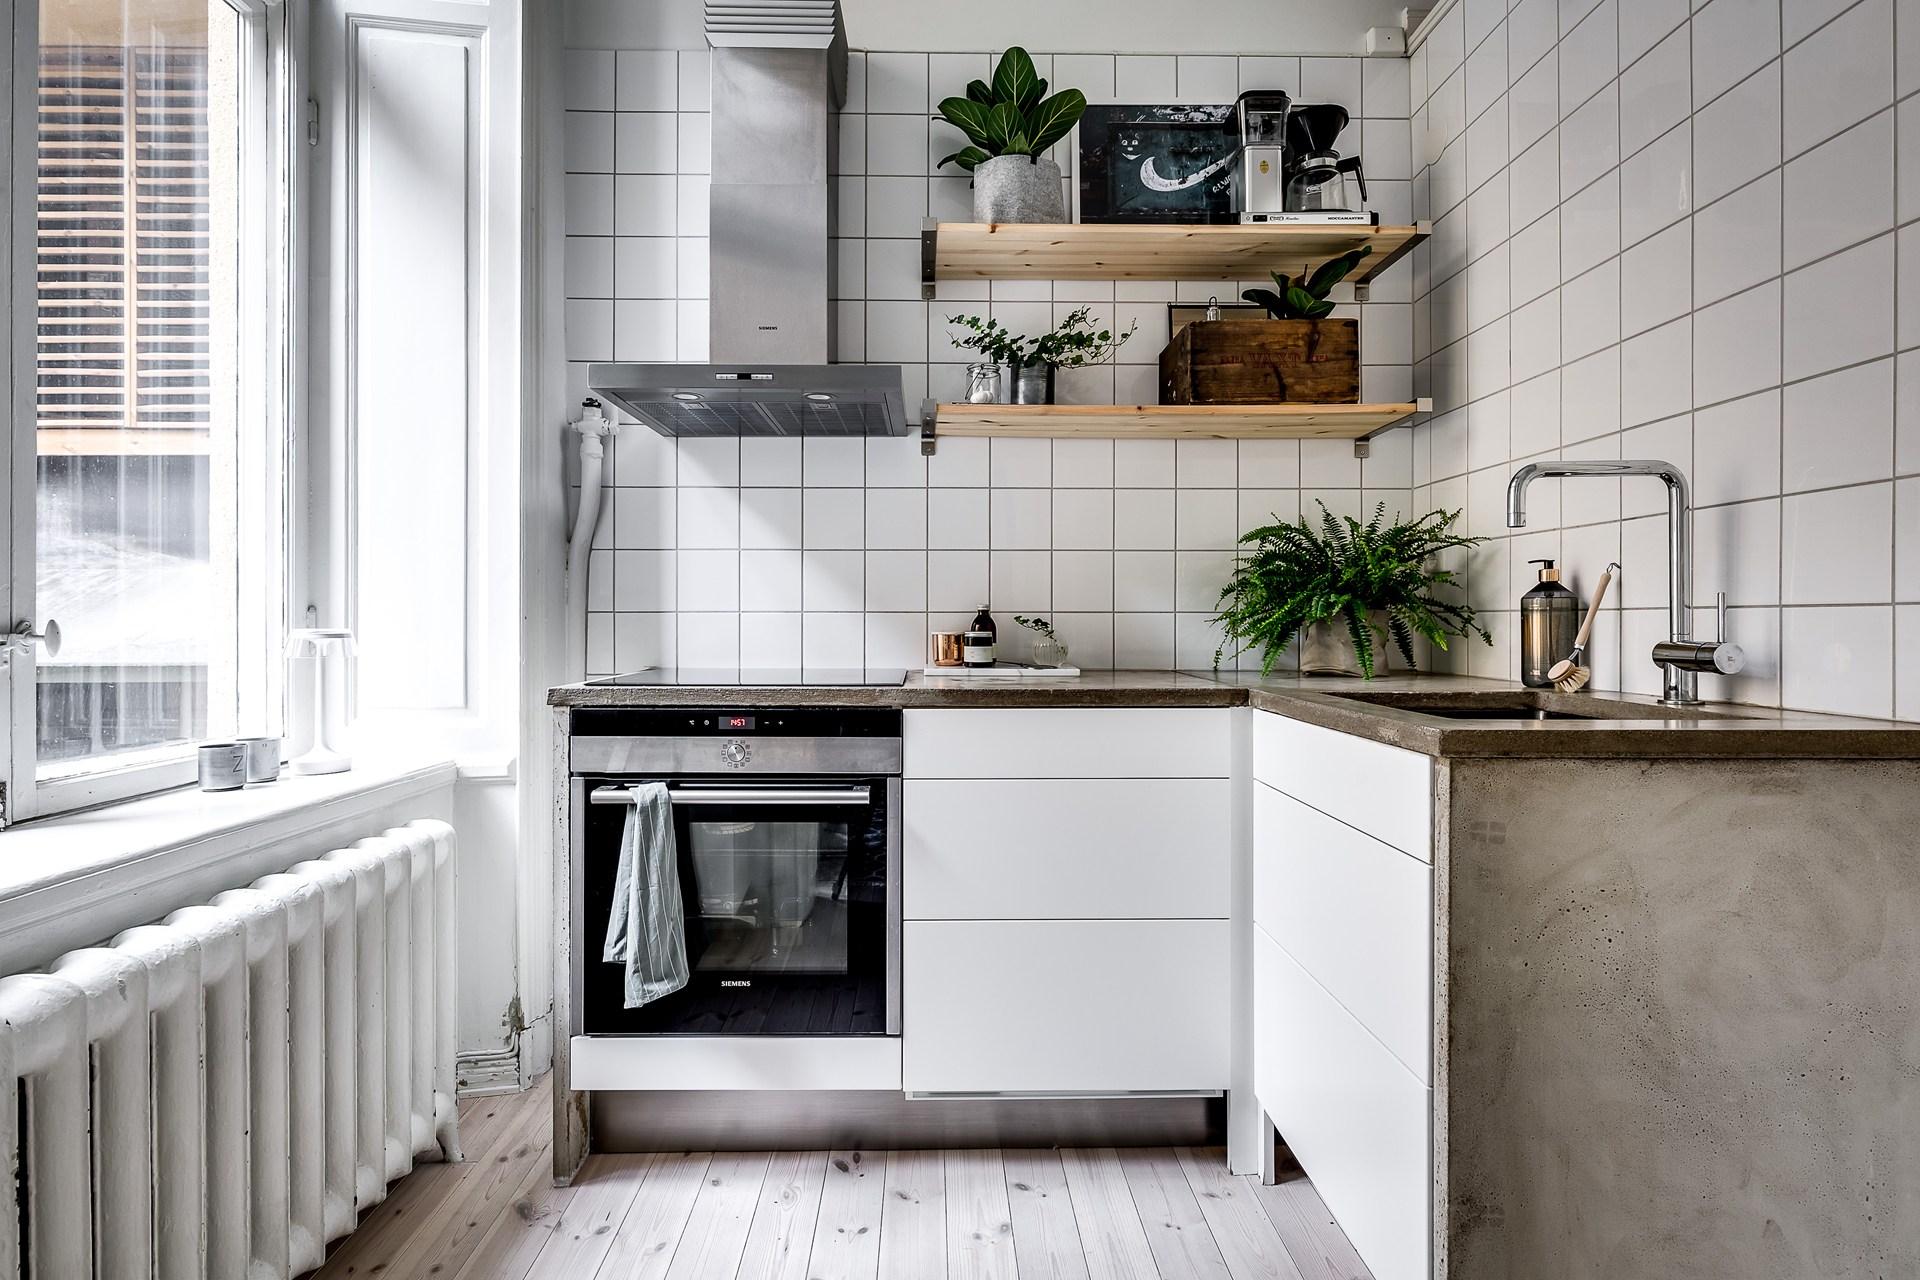 кухня столешница бетон мойка смеситель плита вытяжка плитка полки